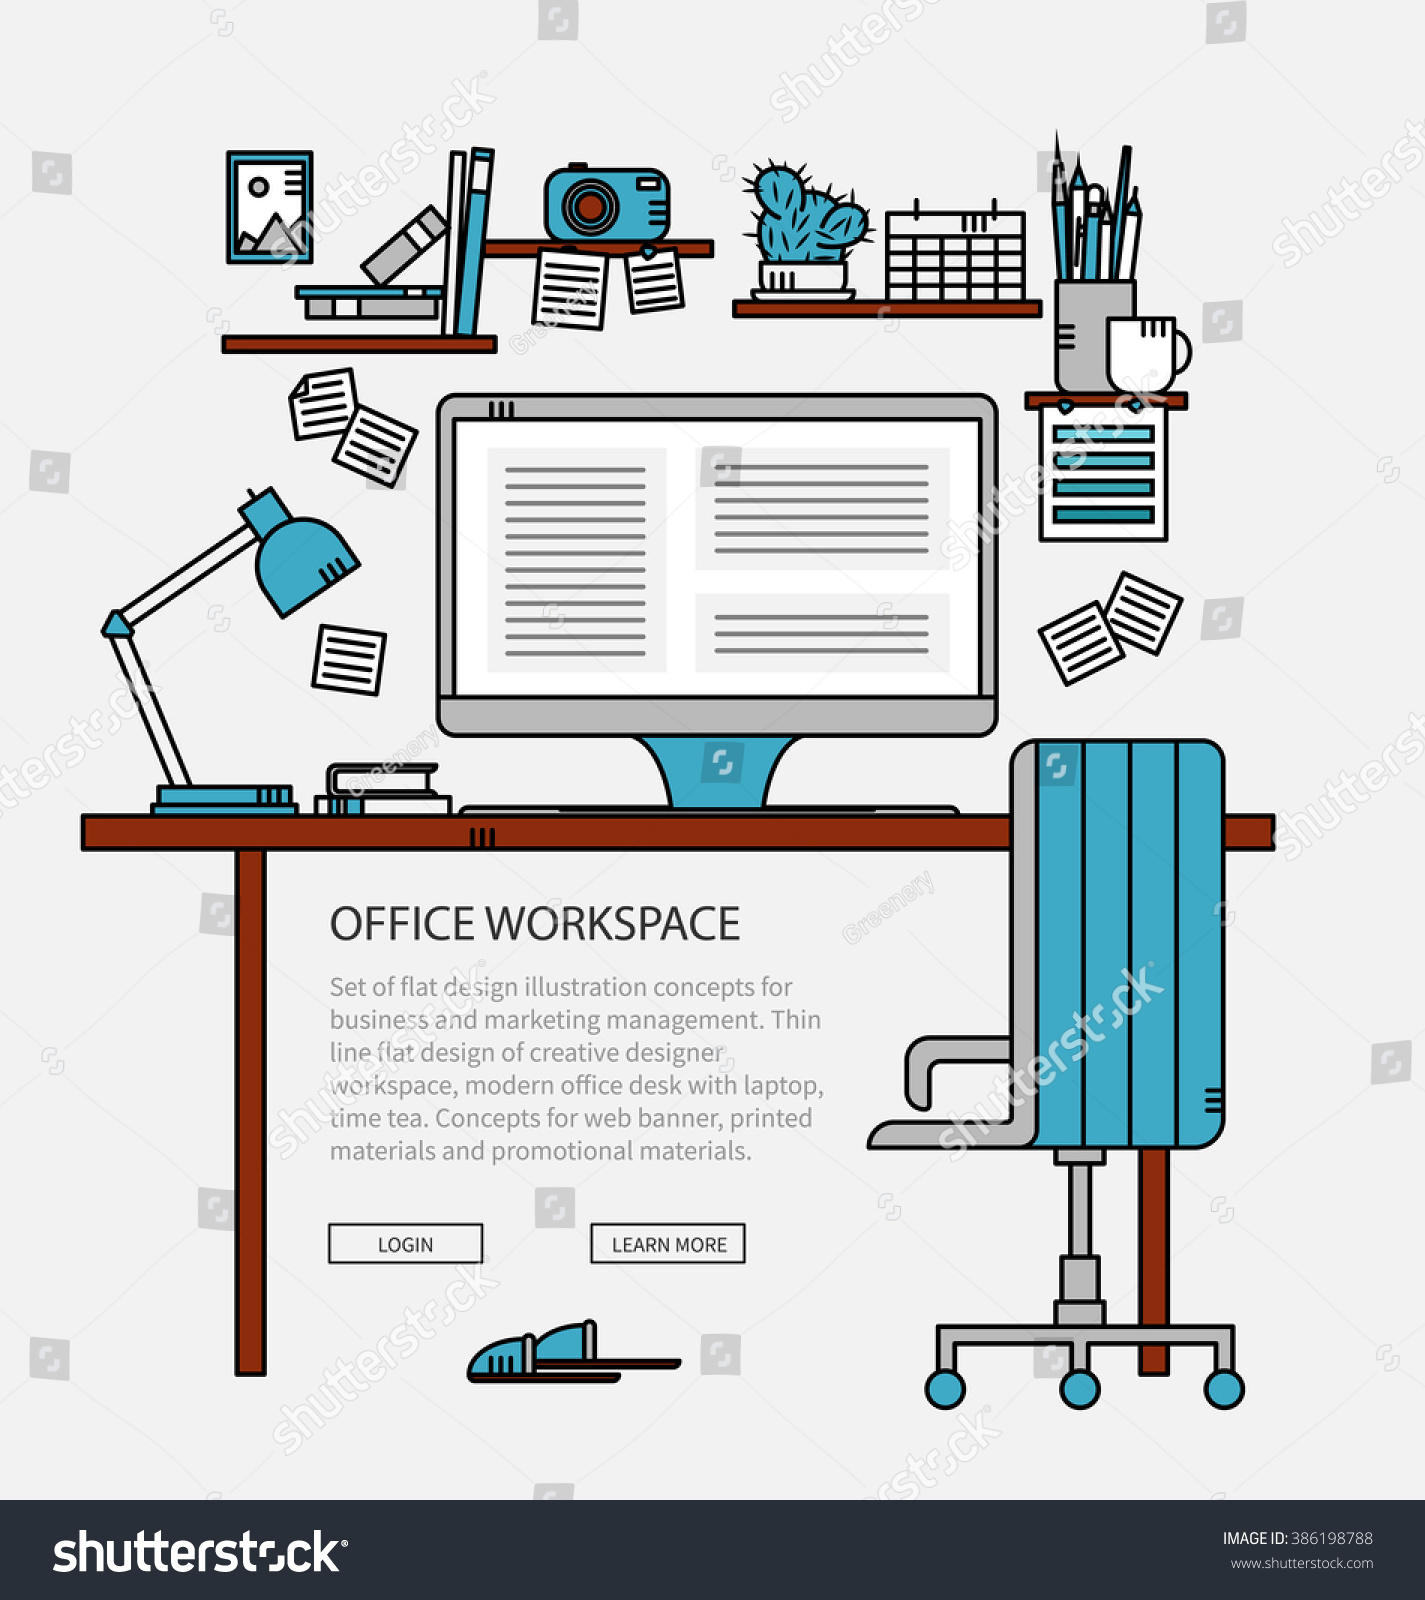 Linear Flat Design Modern Designer Workspace Stock Vector